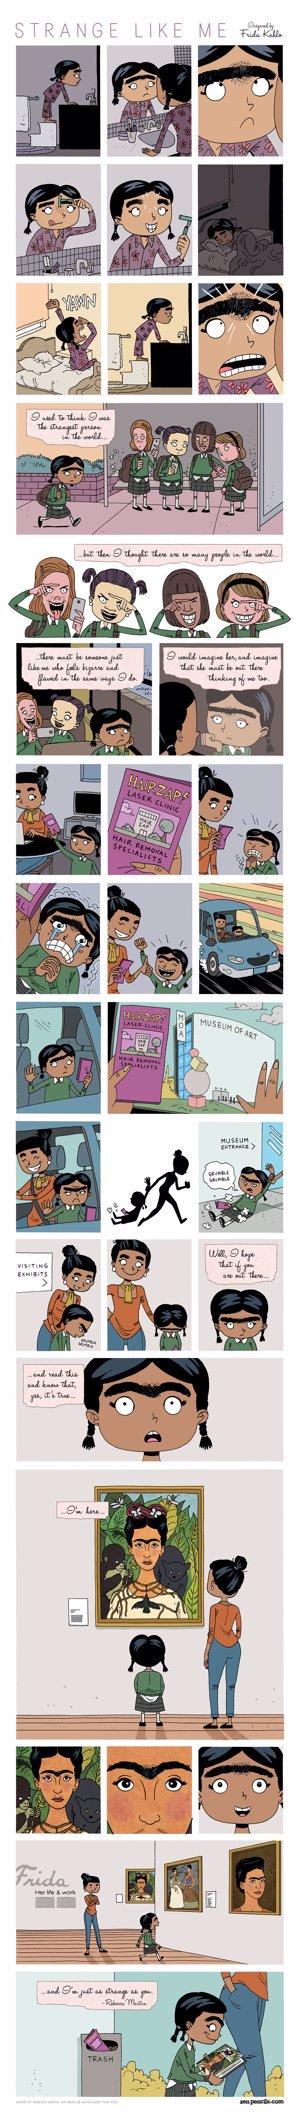 Comic Frida Kahlo